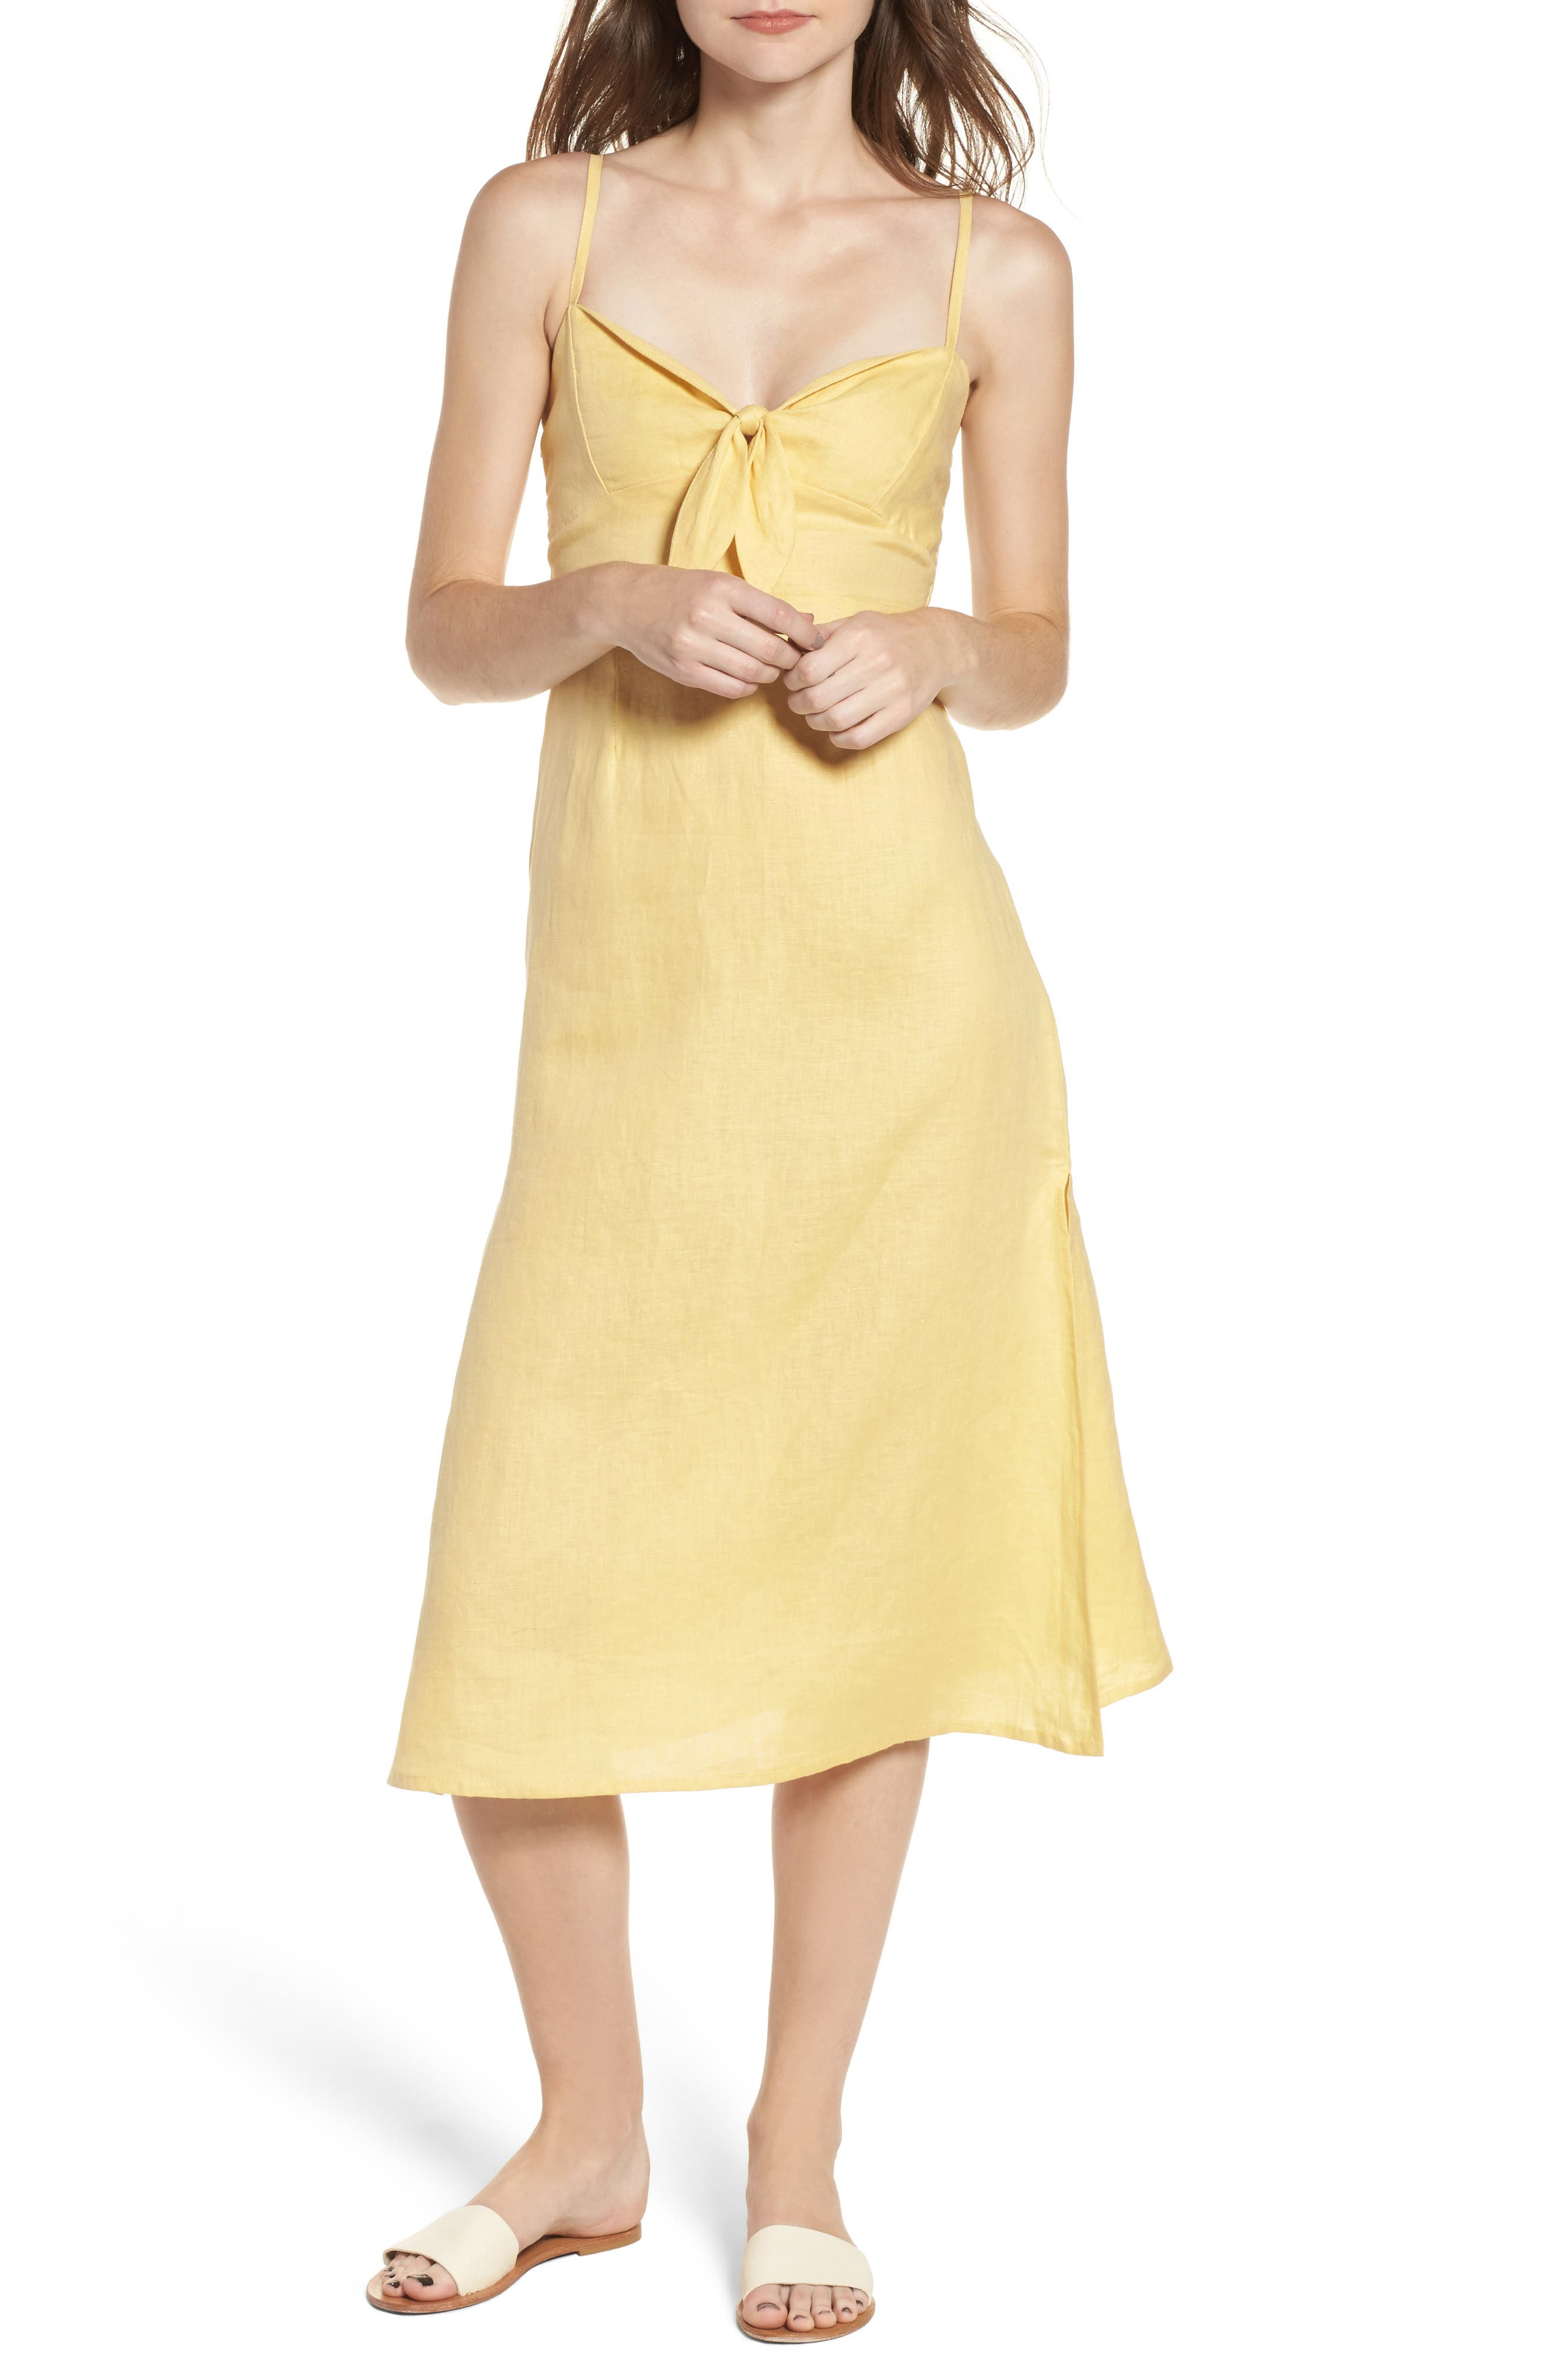 Main Image - FAITHFULL THE BRAND Fiscardo Tie Front Linen Dress